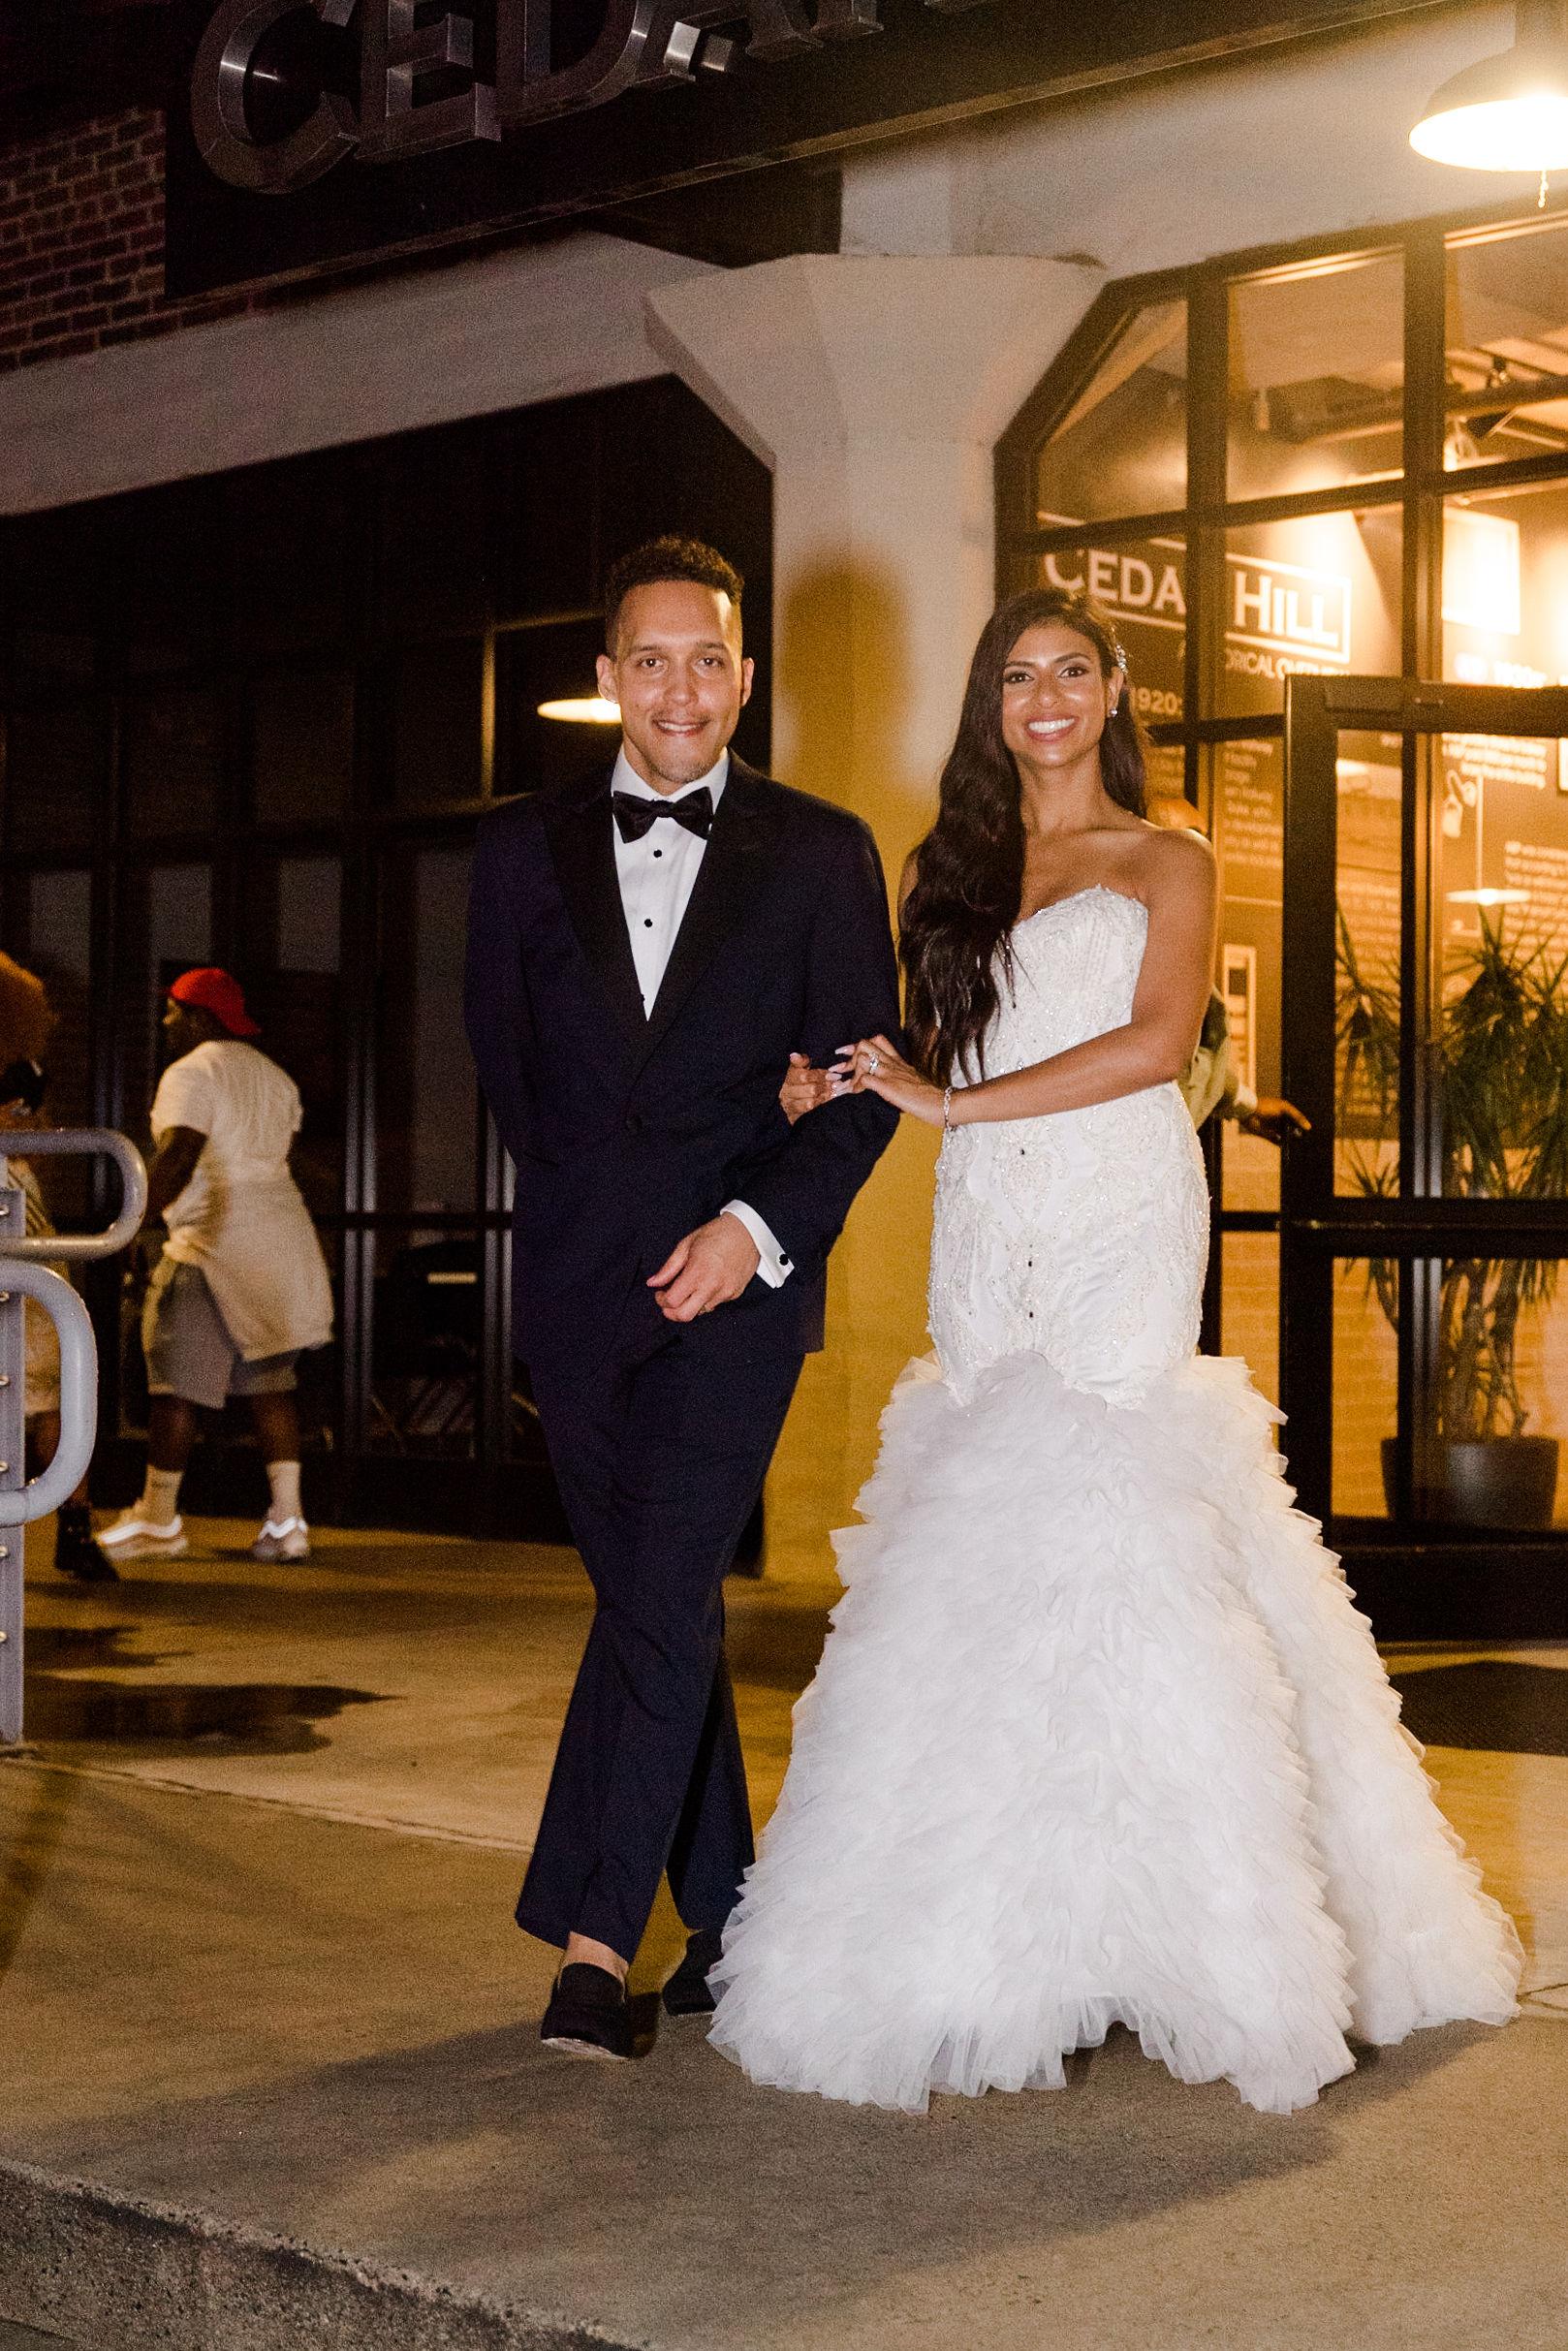 Luxury_Knot_Wedding_Terrace_at_Cedar_Hill_Wedding_Black_Tie_Wedding_Lisa&JasonParker_Katherynjeannephotography1032.JPG